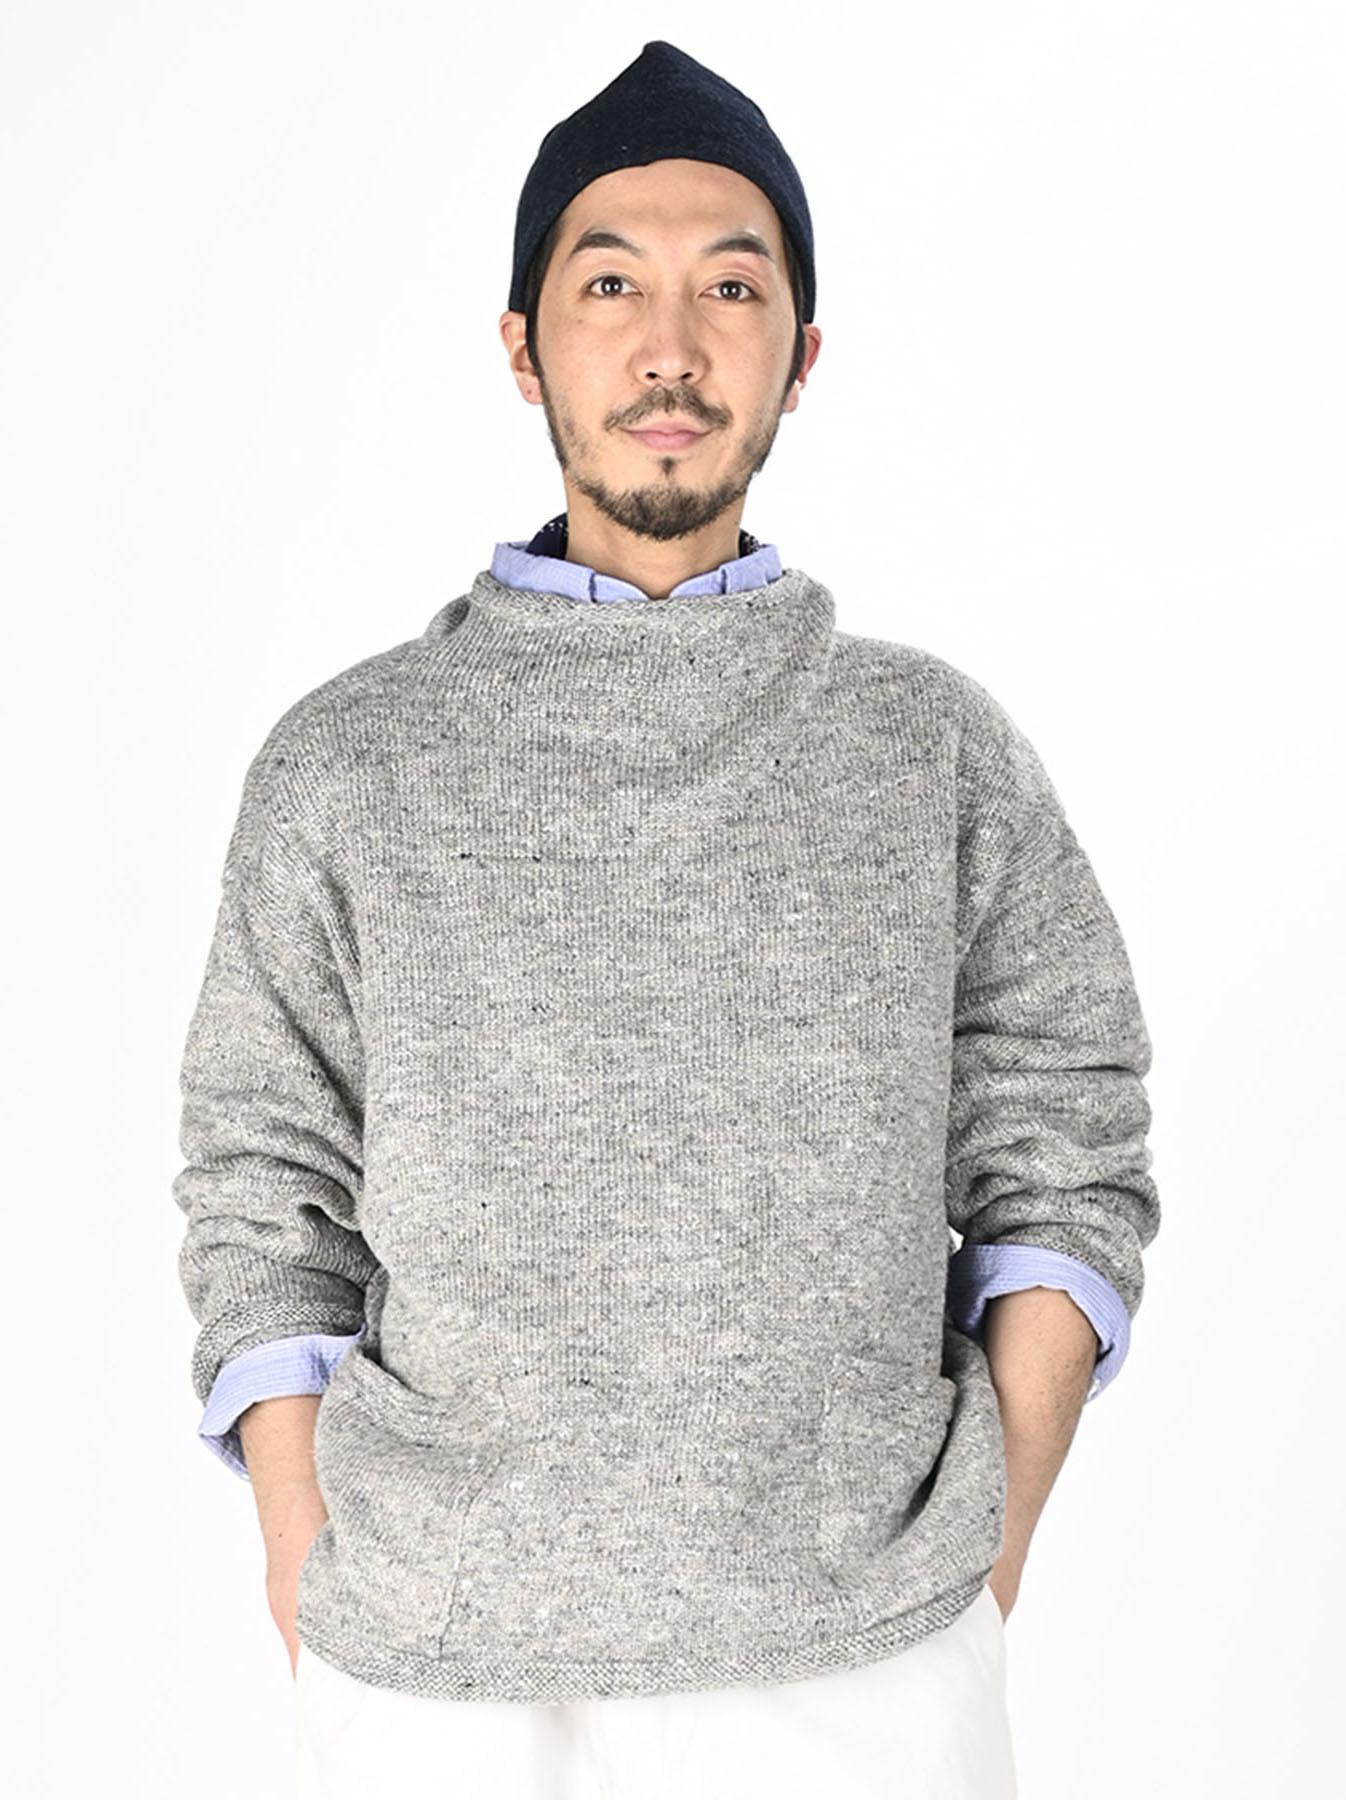 WH Linen Tweed Knit-sew 908 Umahiko Sweater (0321)-3